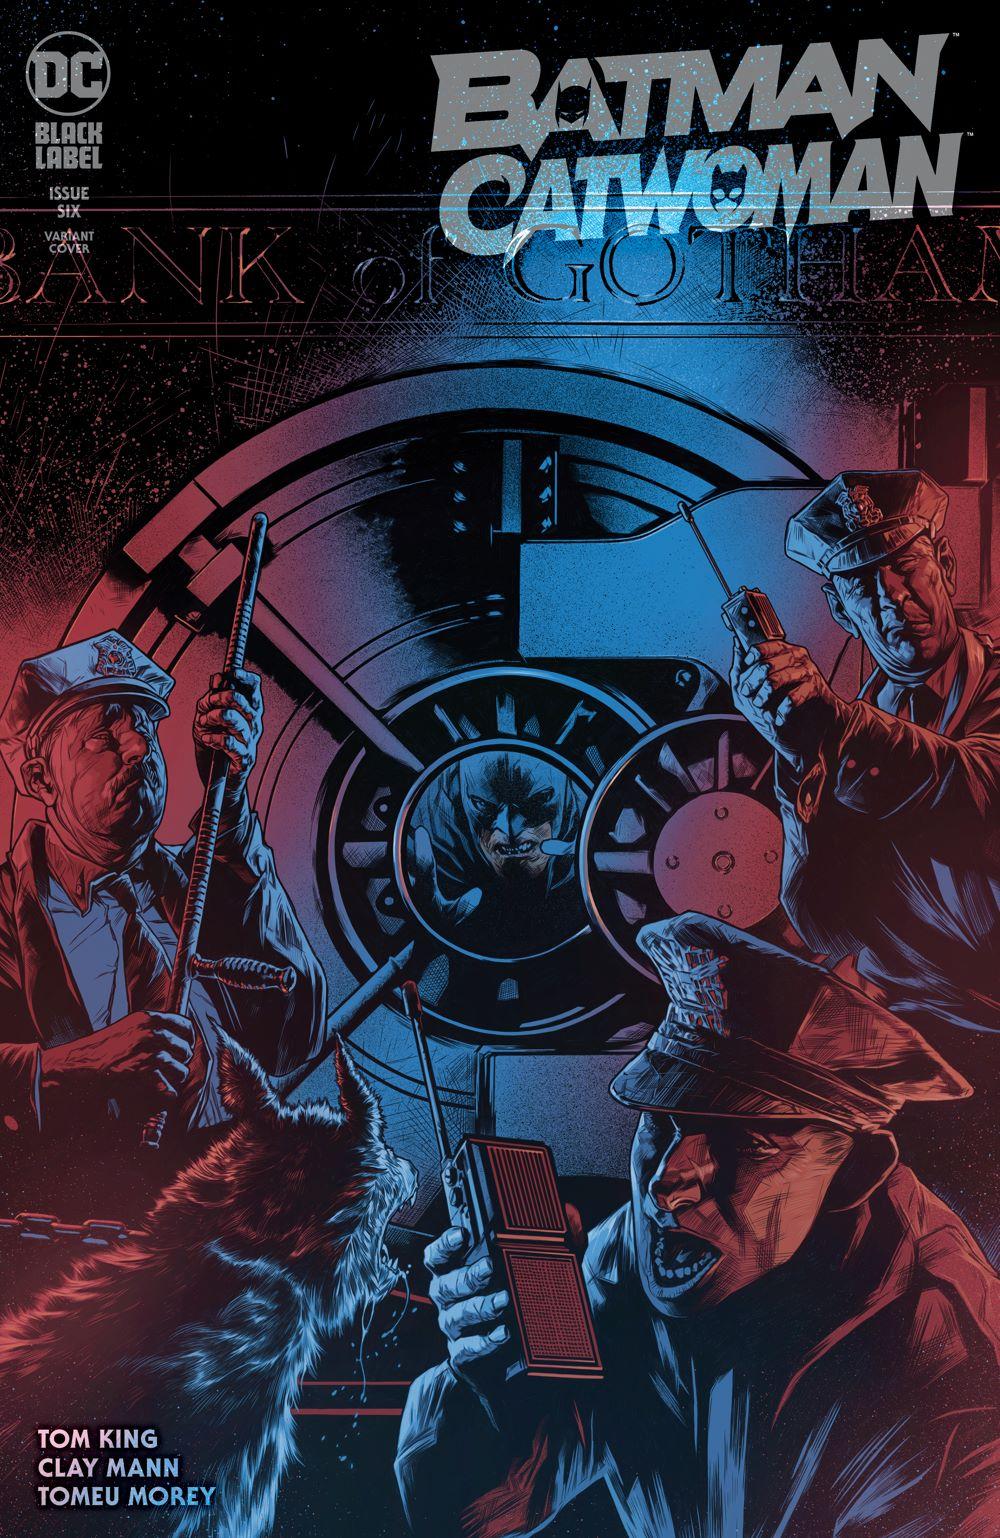 BM_CTW_Cv7_CHAREST_var DC Comics August 2021 Solicitations